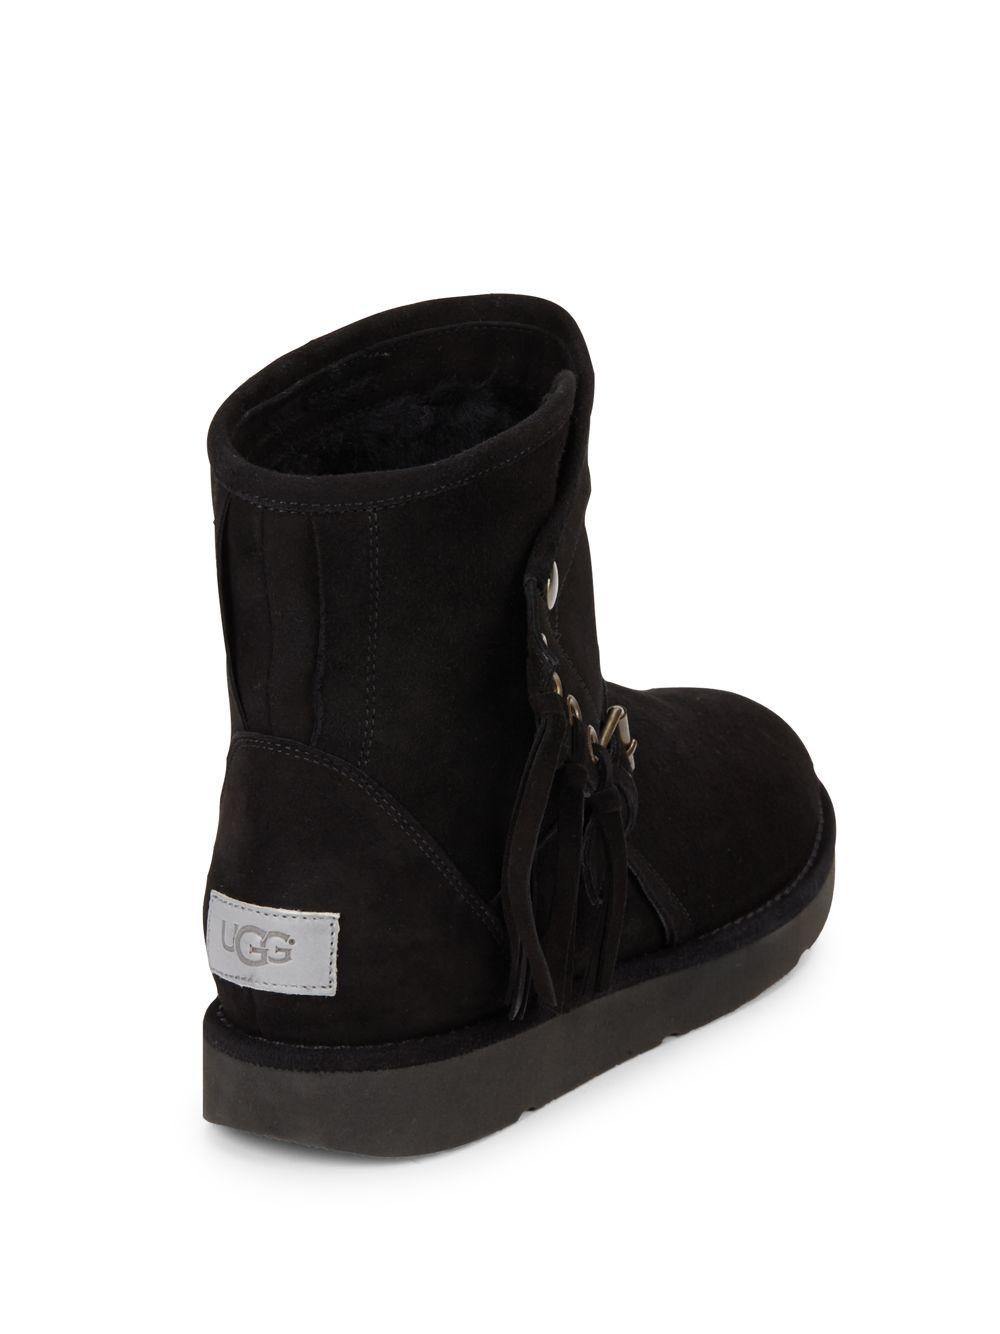 Ugg Karisa Fur Trimmed Suede Buckle Ankle Boots In Black